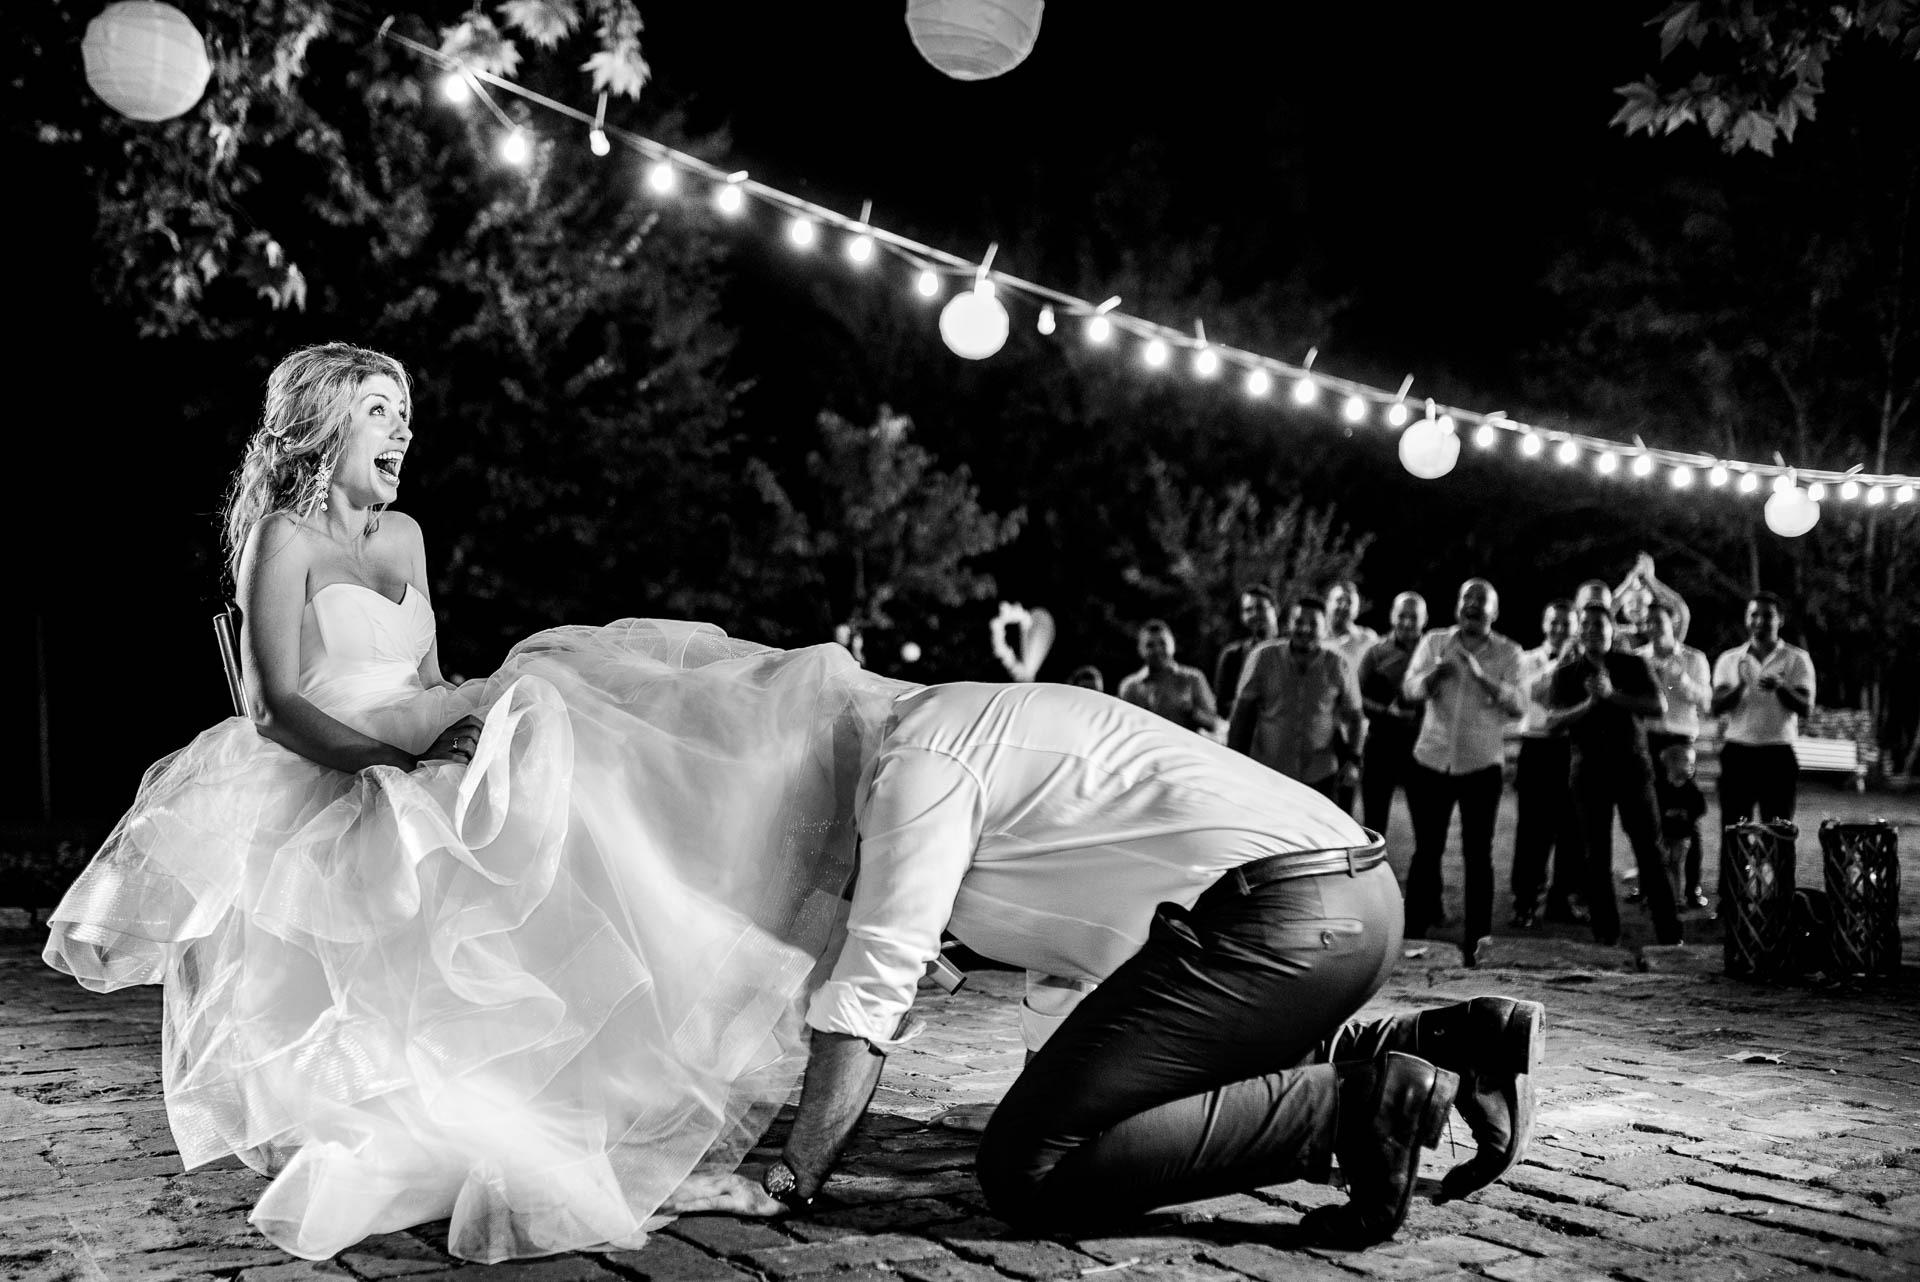 Hristina Handzhieva是一位婚礼摄影师